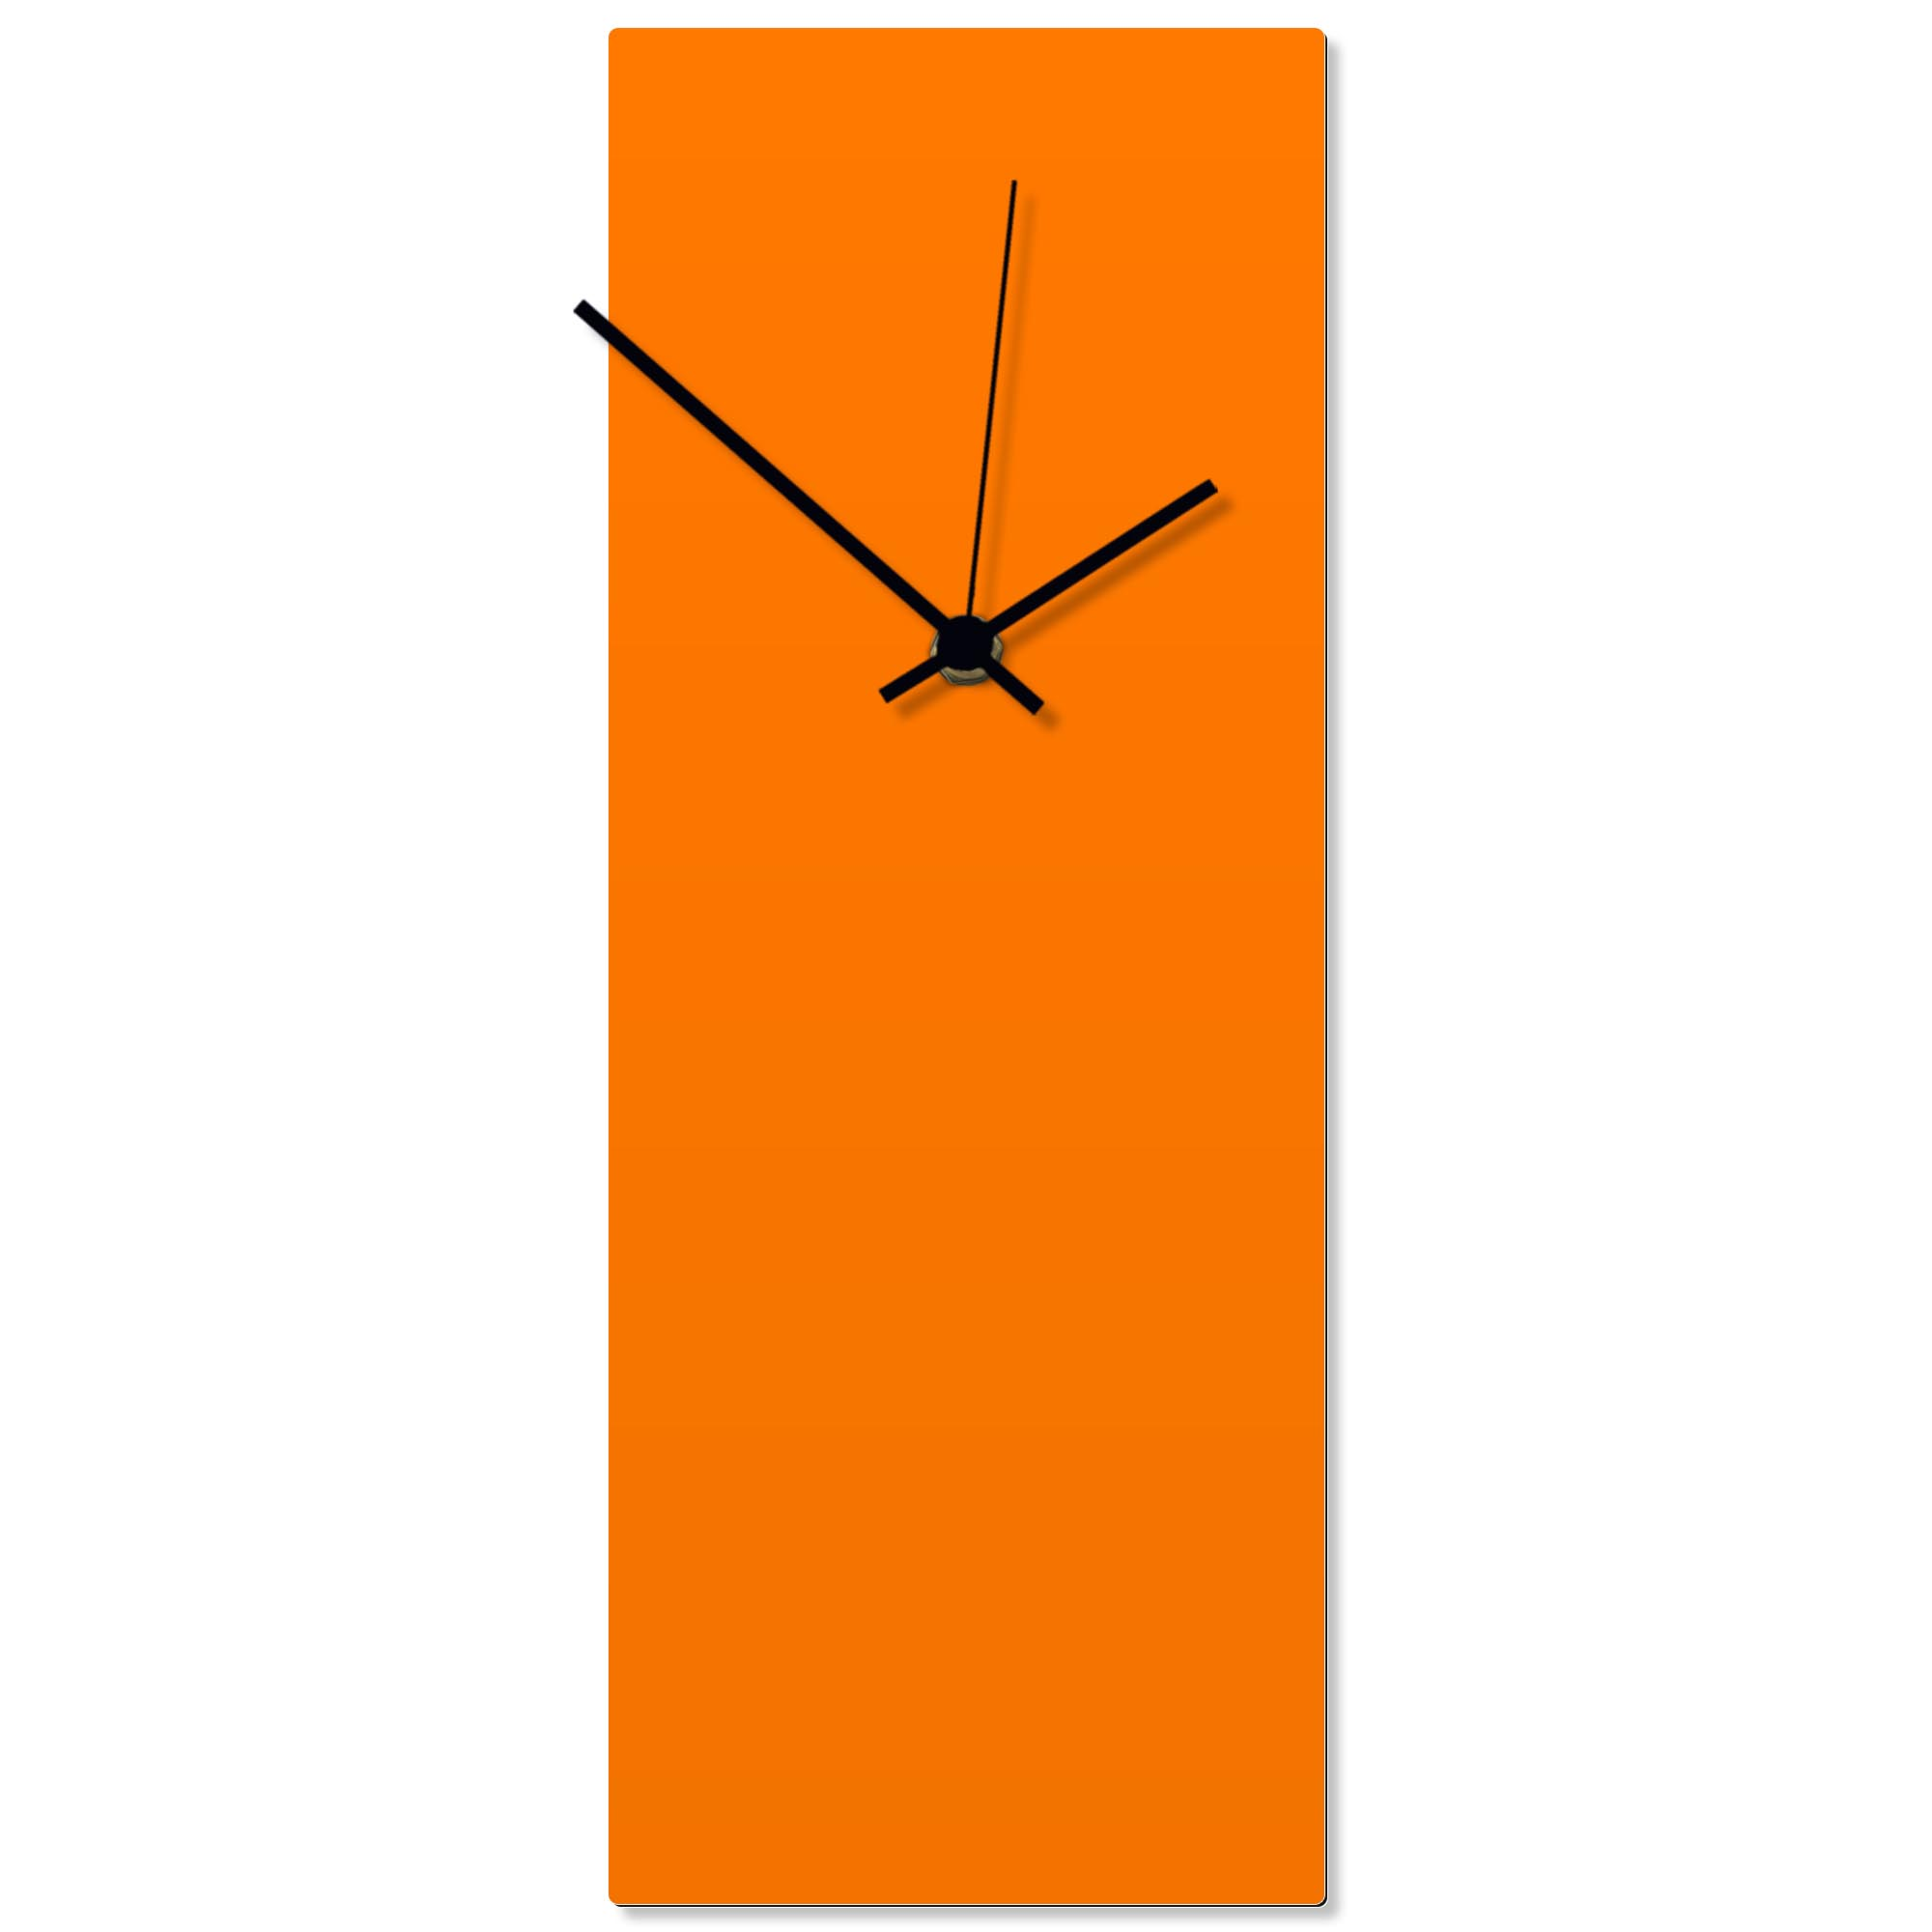 Orangeout Black Clock 6x16in. Aluminum Polymetal